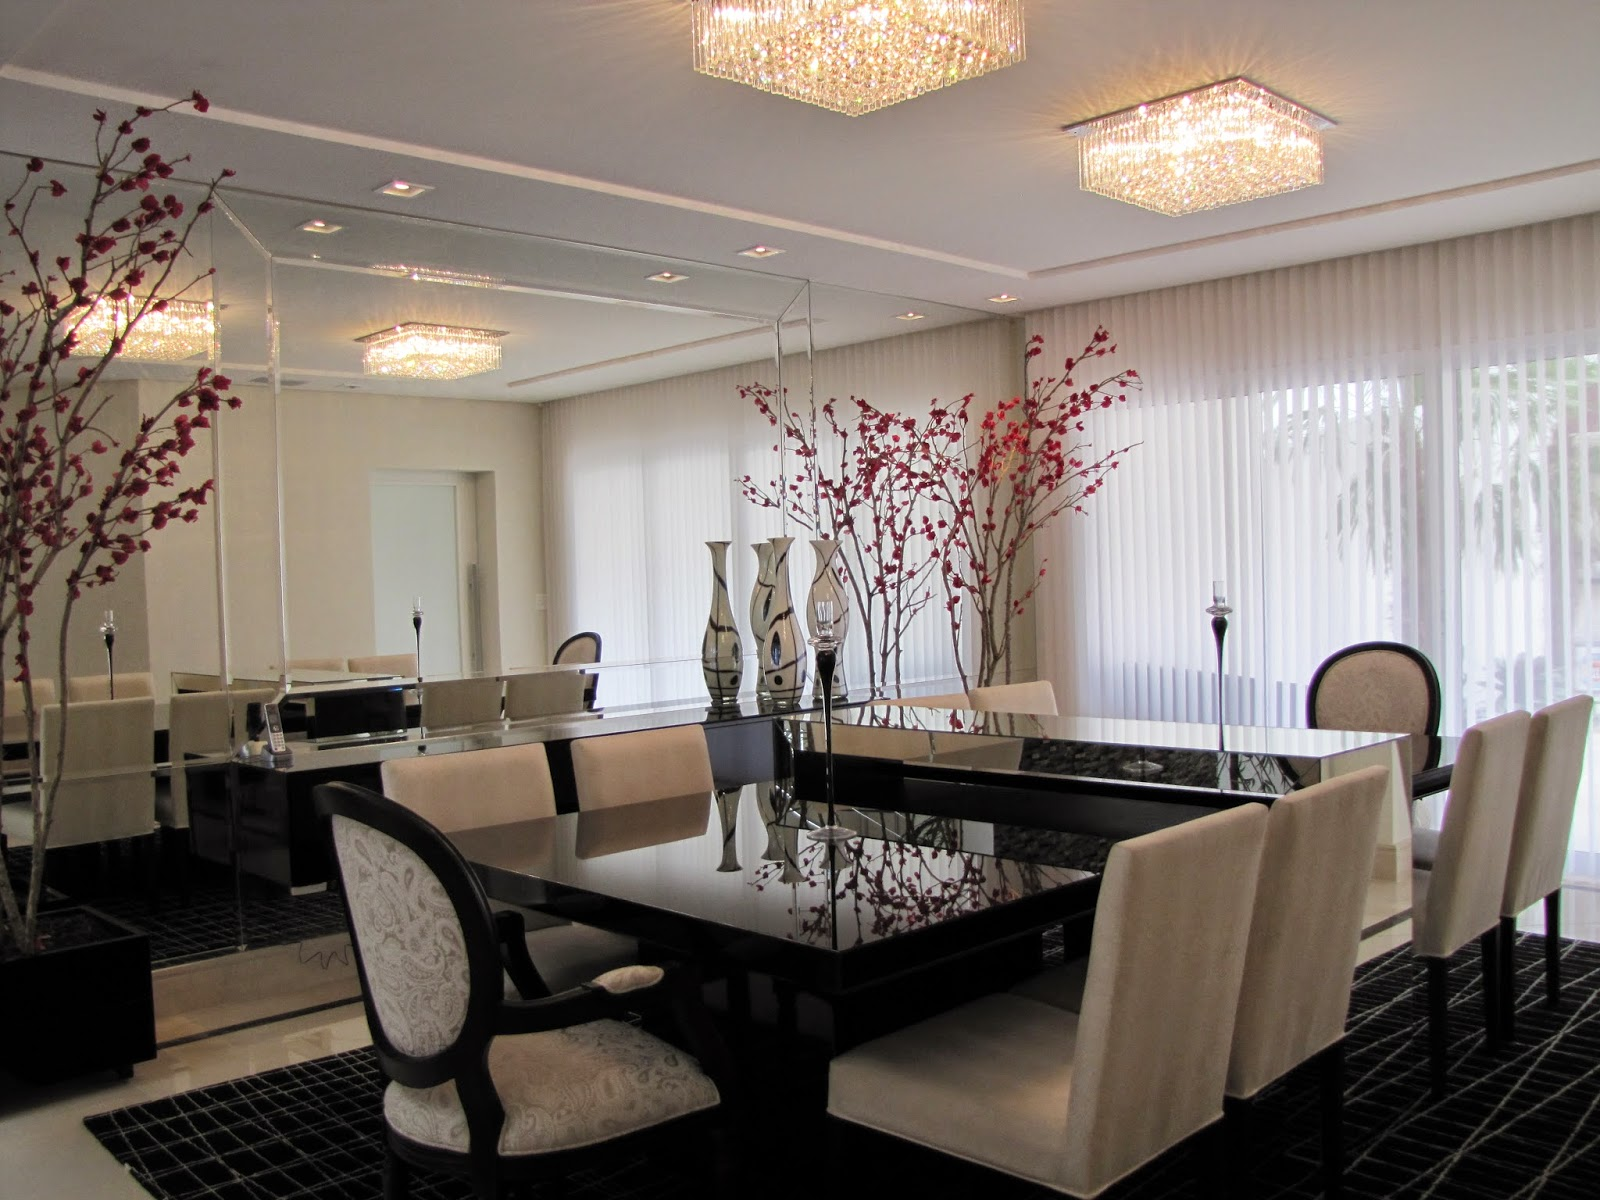 Construindo minha casa clean salas de jantar decoradas Mesas de cristal pequenas